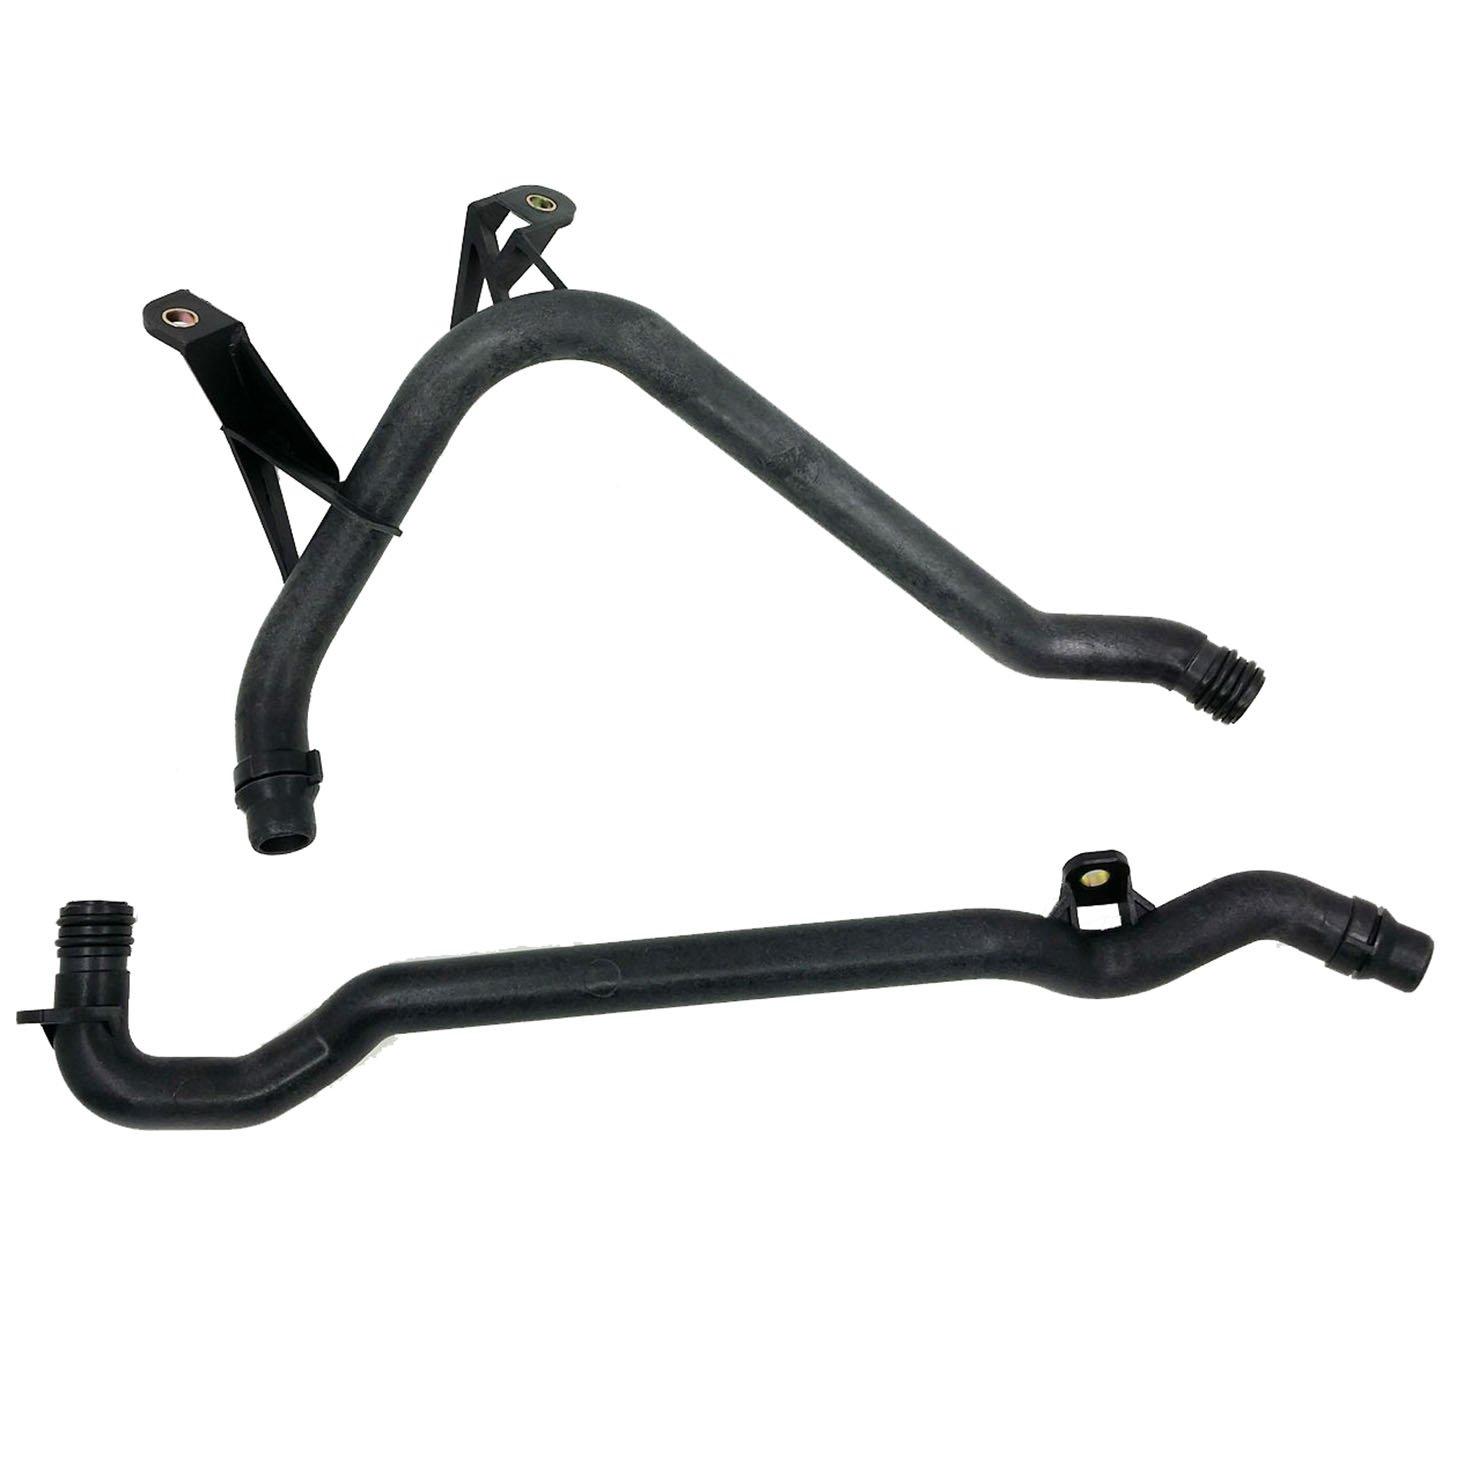 Podoy E46 Coolant Pipe & Heater Inlet Pipe for BMW E39 Z3 Z4 OEM 11531705210, 11537502525 10U0629